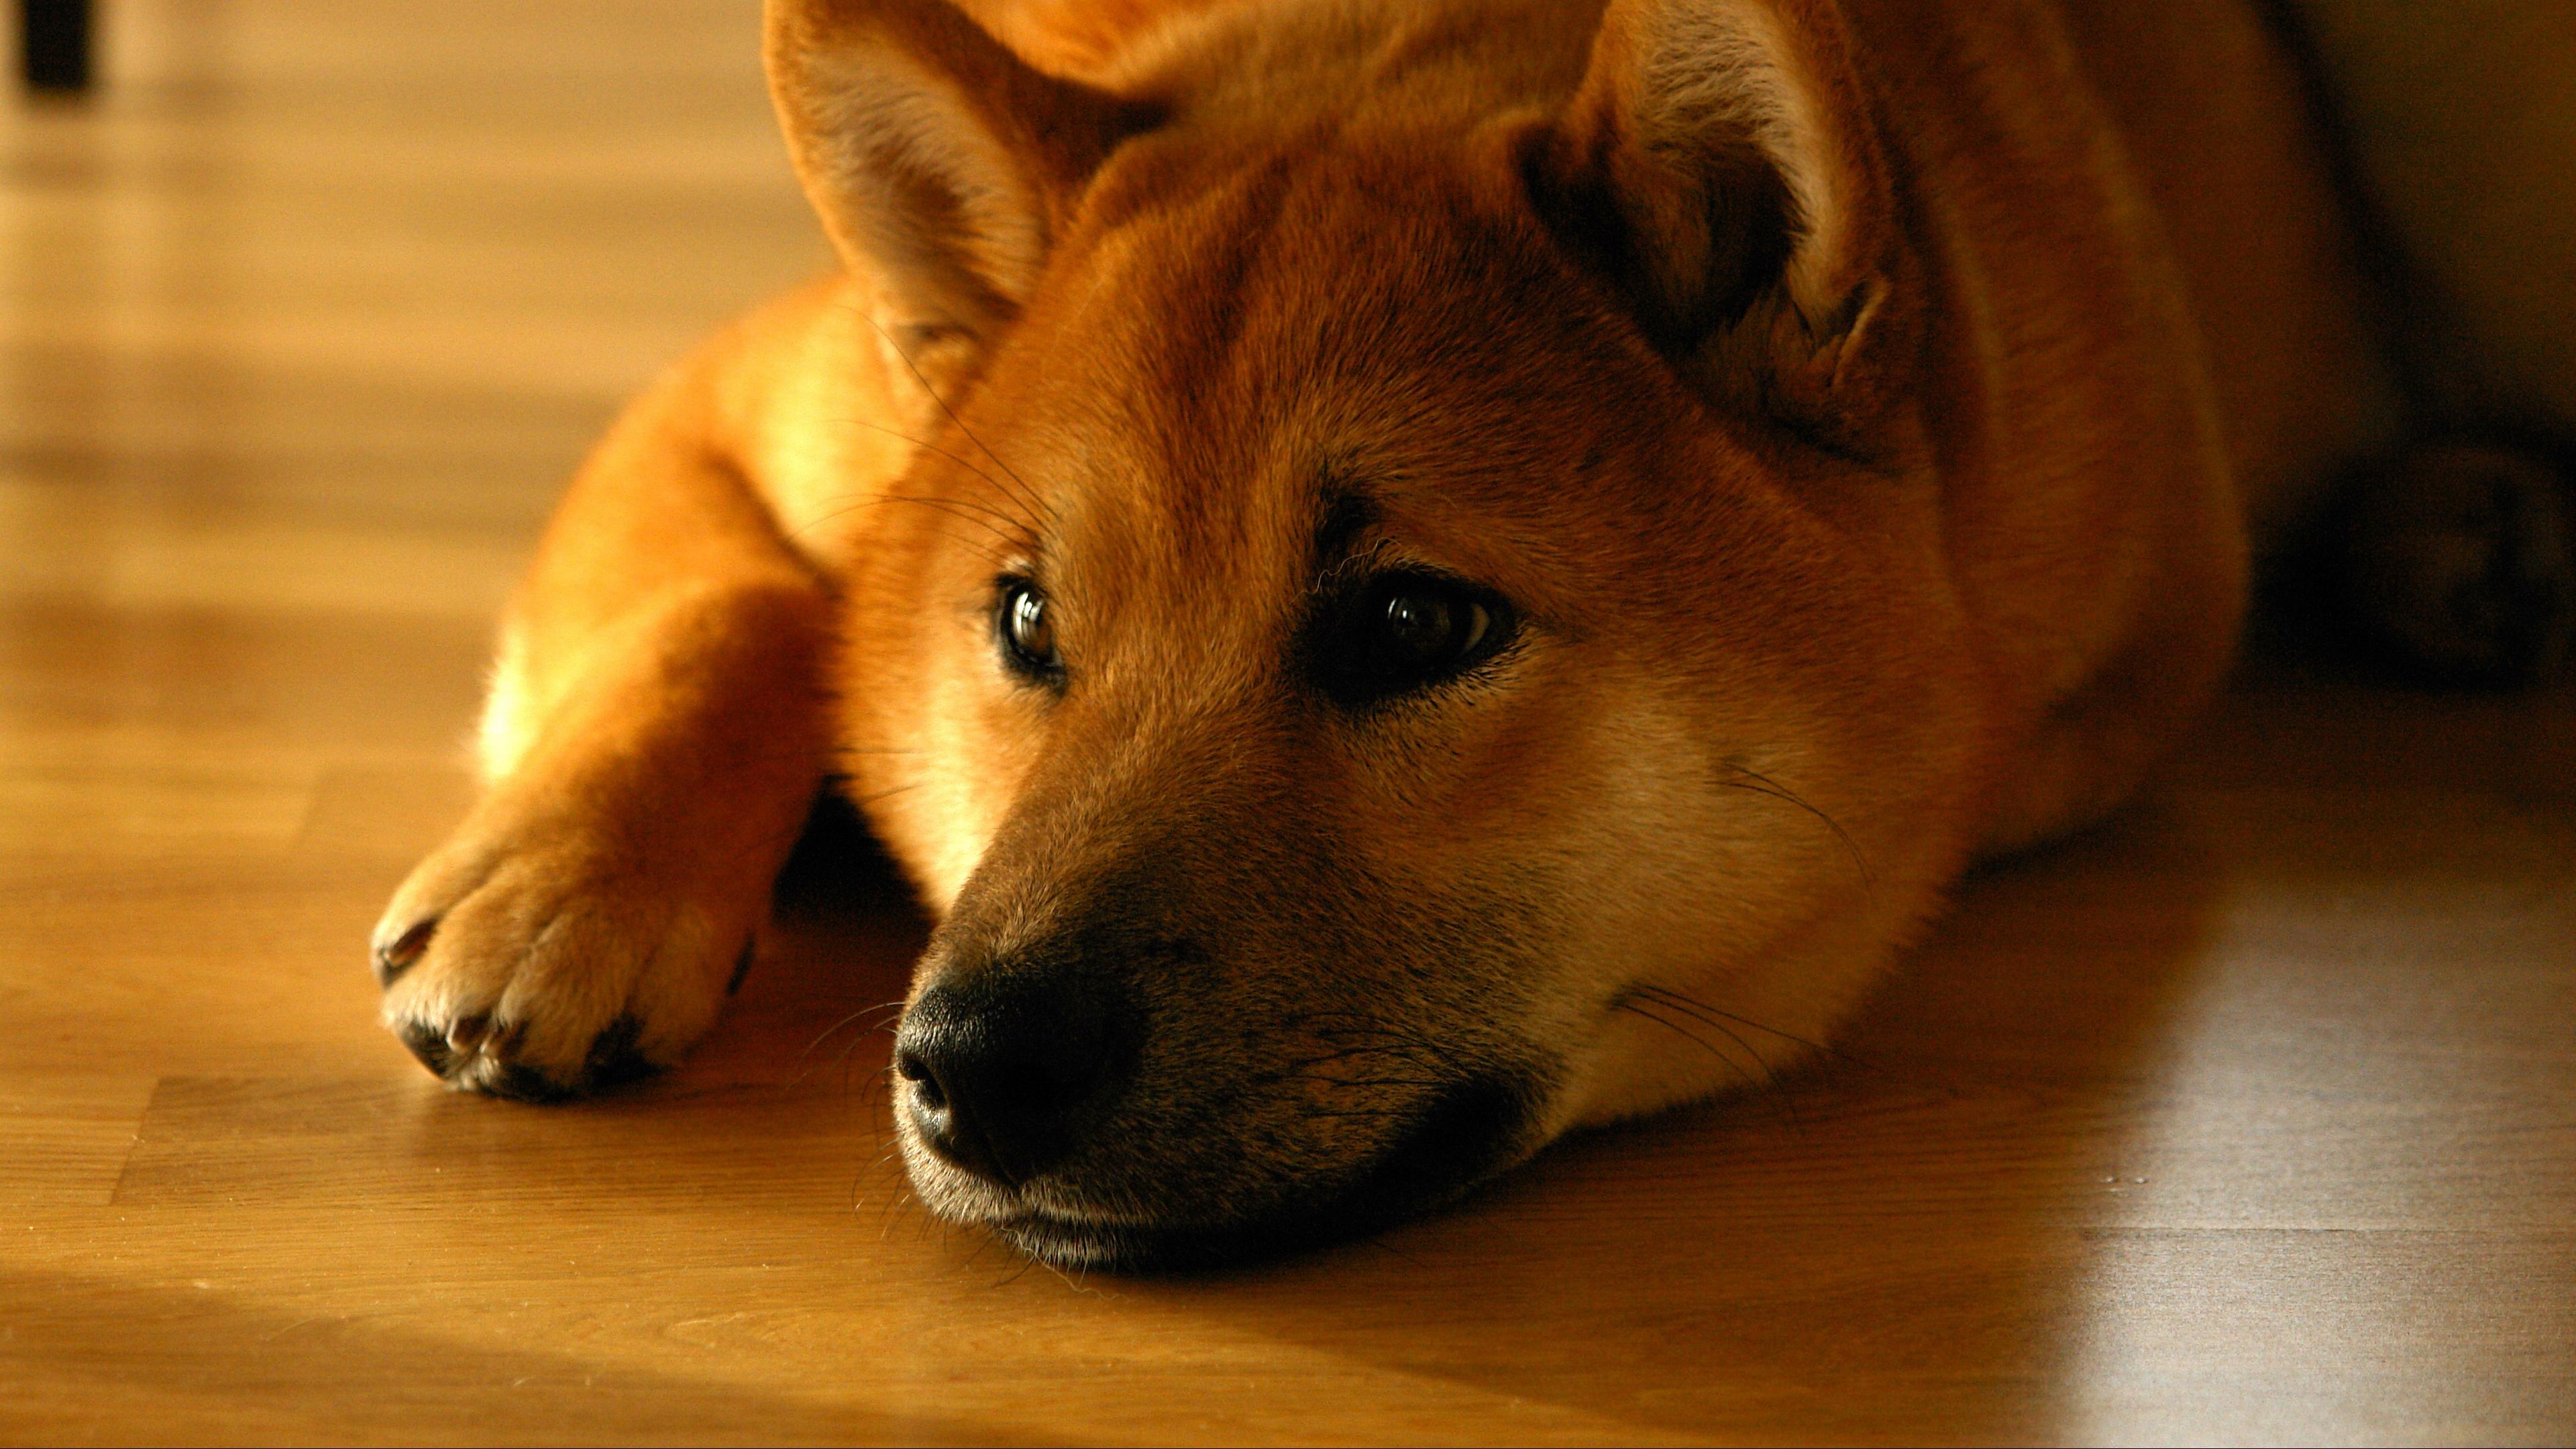 Wallpaper 4k Shiba Inu Dog Muzzle Lies 4k Dog Muzzle Shiba Inu